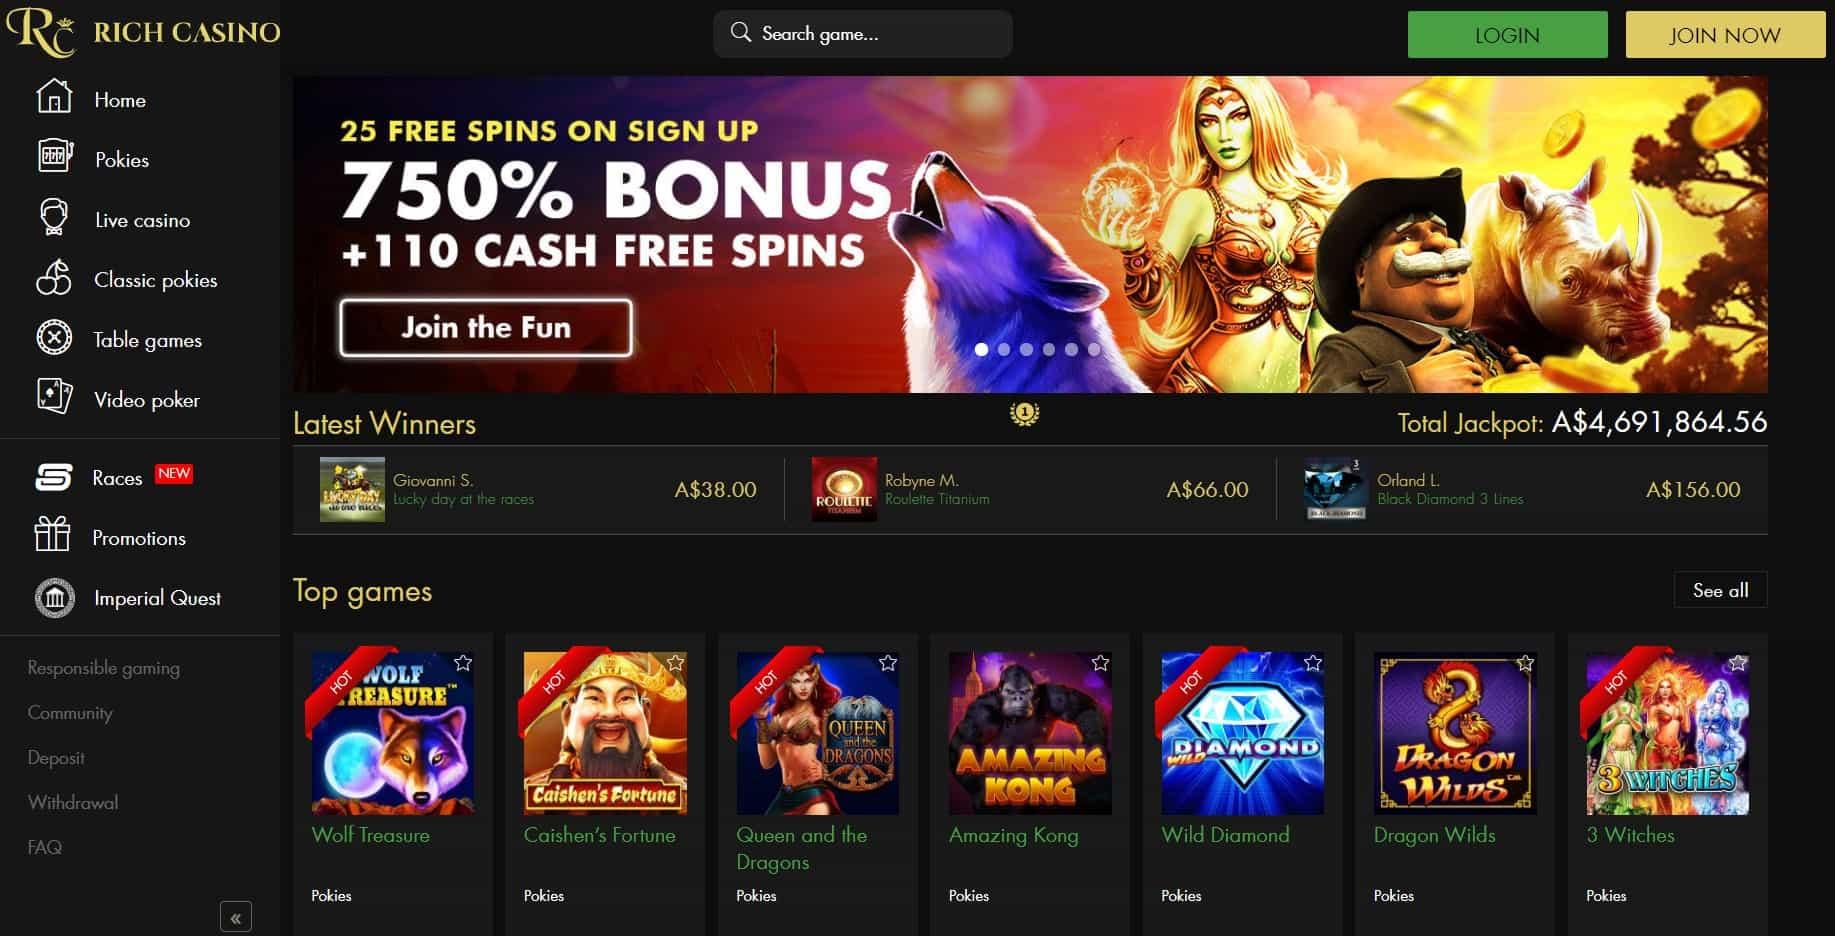 rich casino homepage